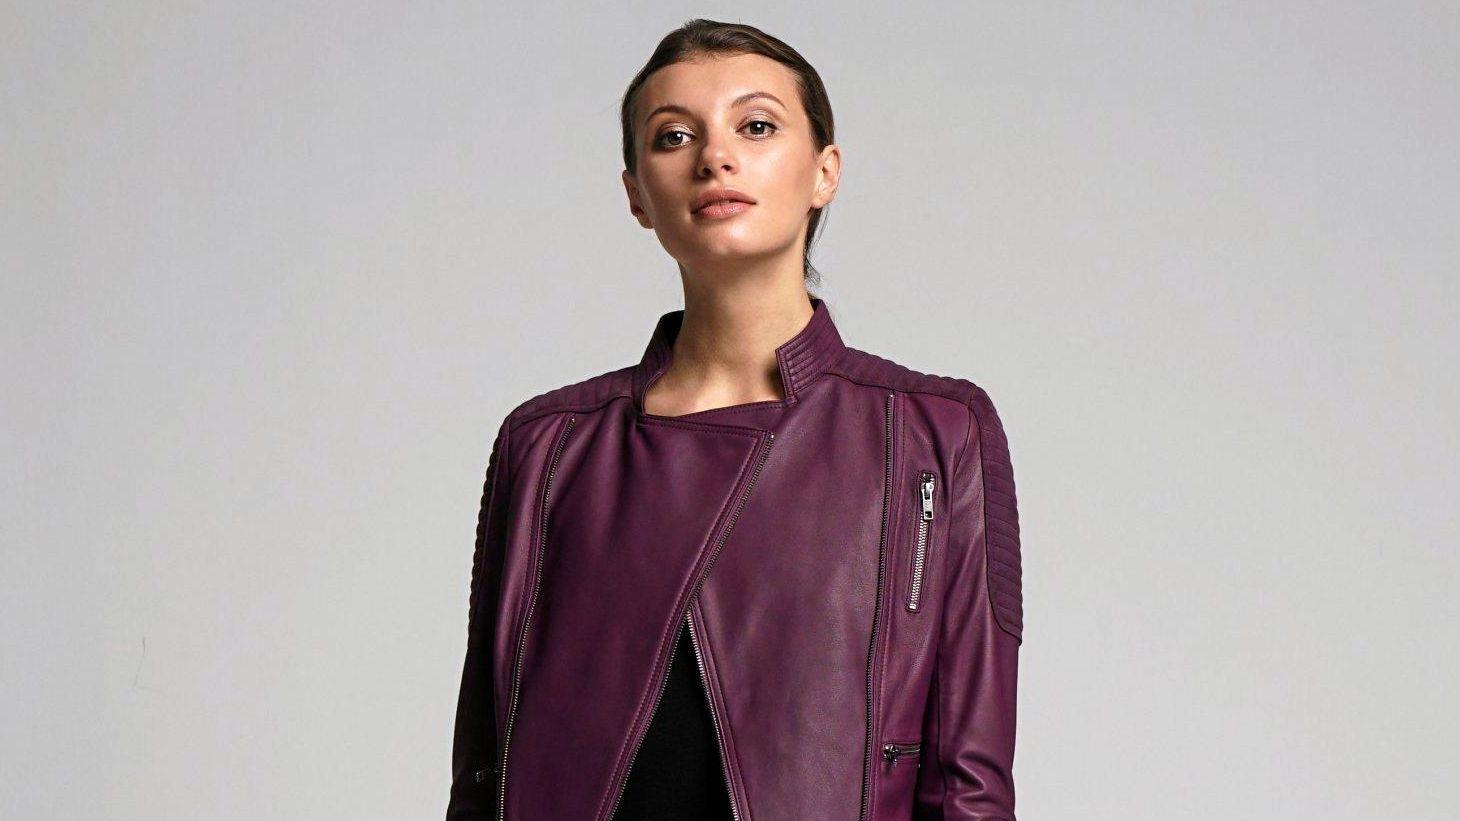 2NDSKIN Gracie Leather Jacket, $629, 2ndskinonline.com